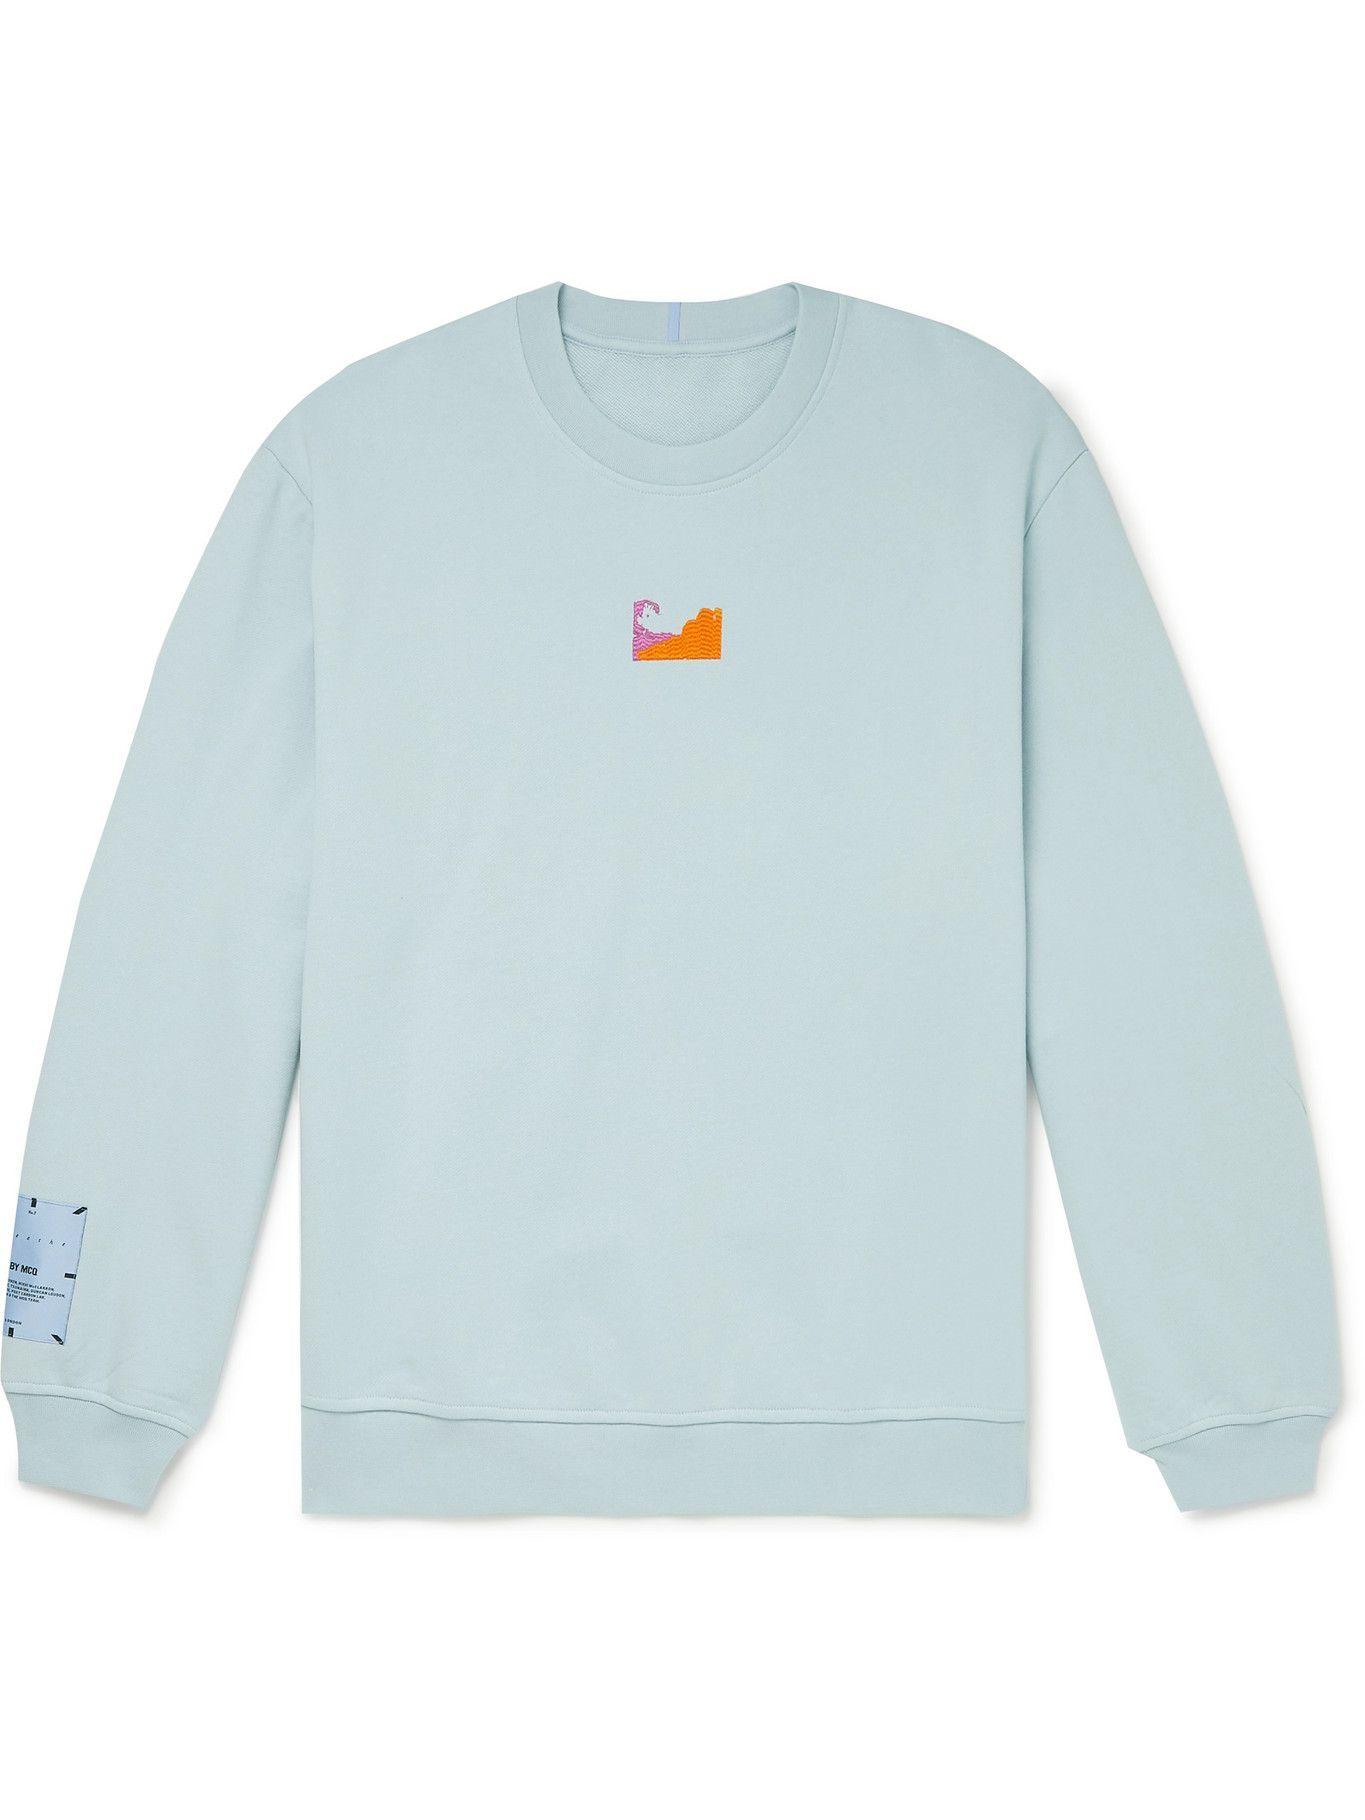 MCQ - Breathe Logo-Appliquéd Cotton-Jersey Sweatshirt - Blue